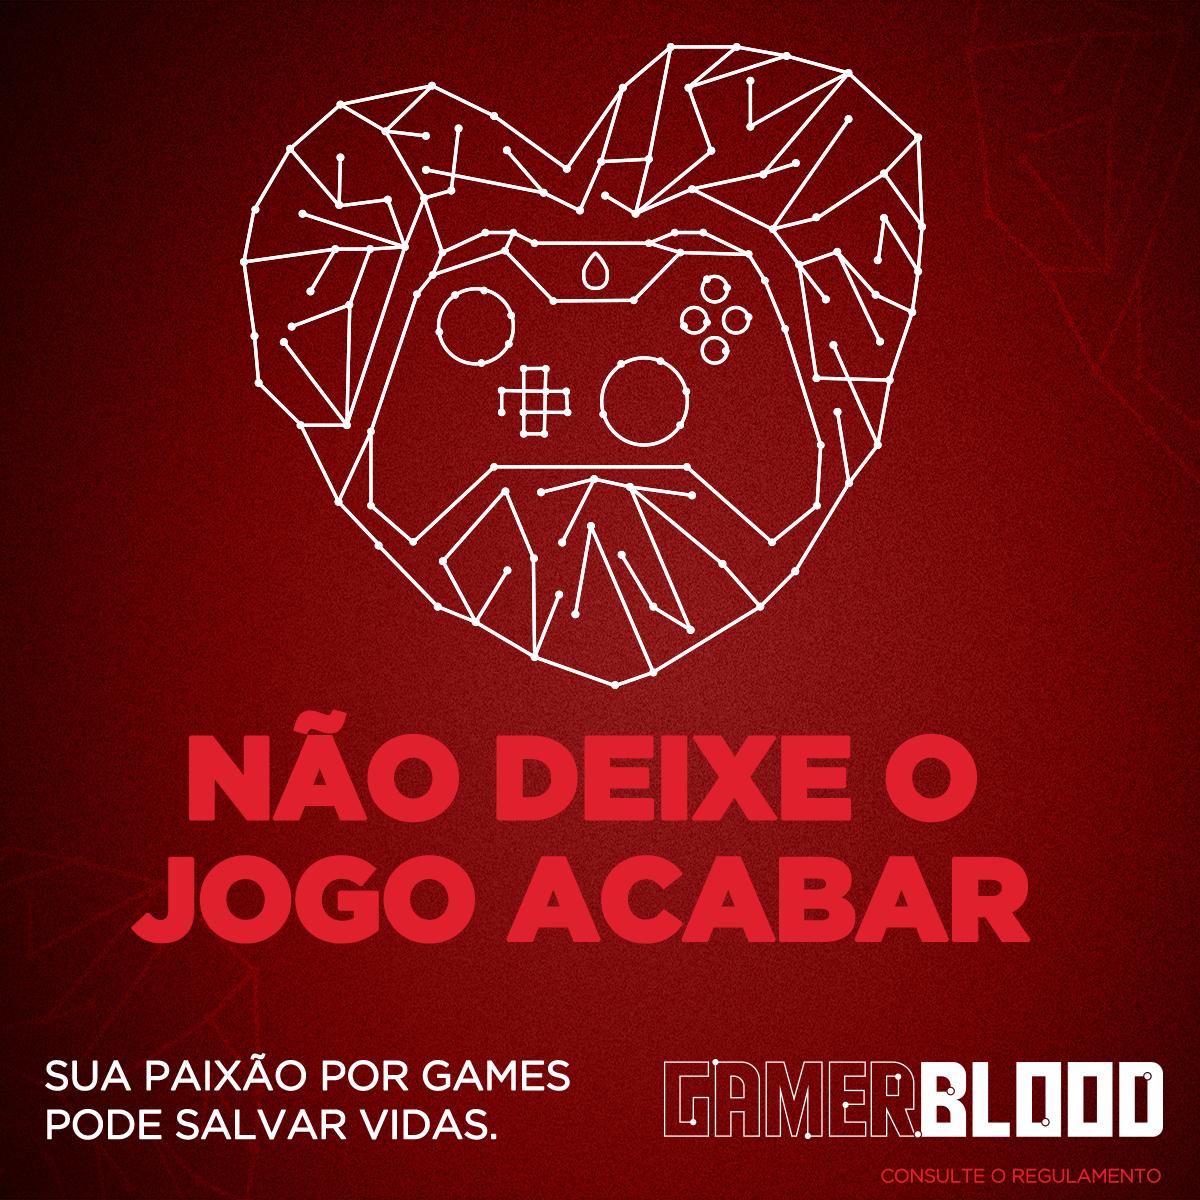 gamerblood2